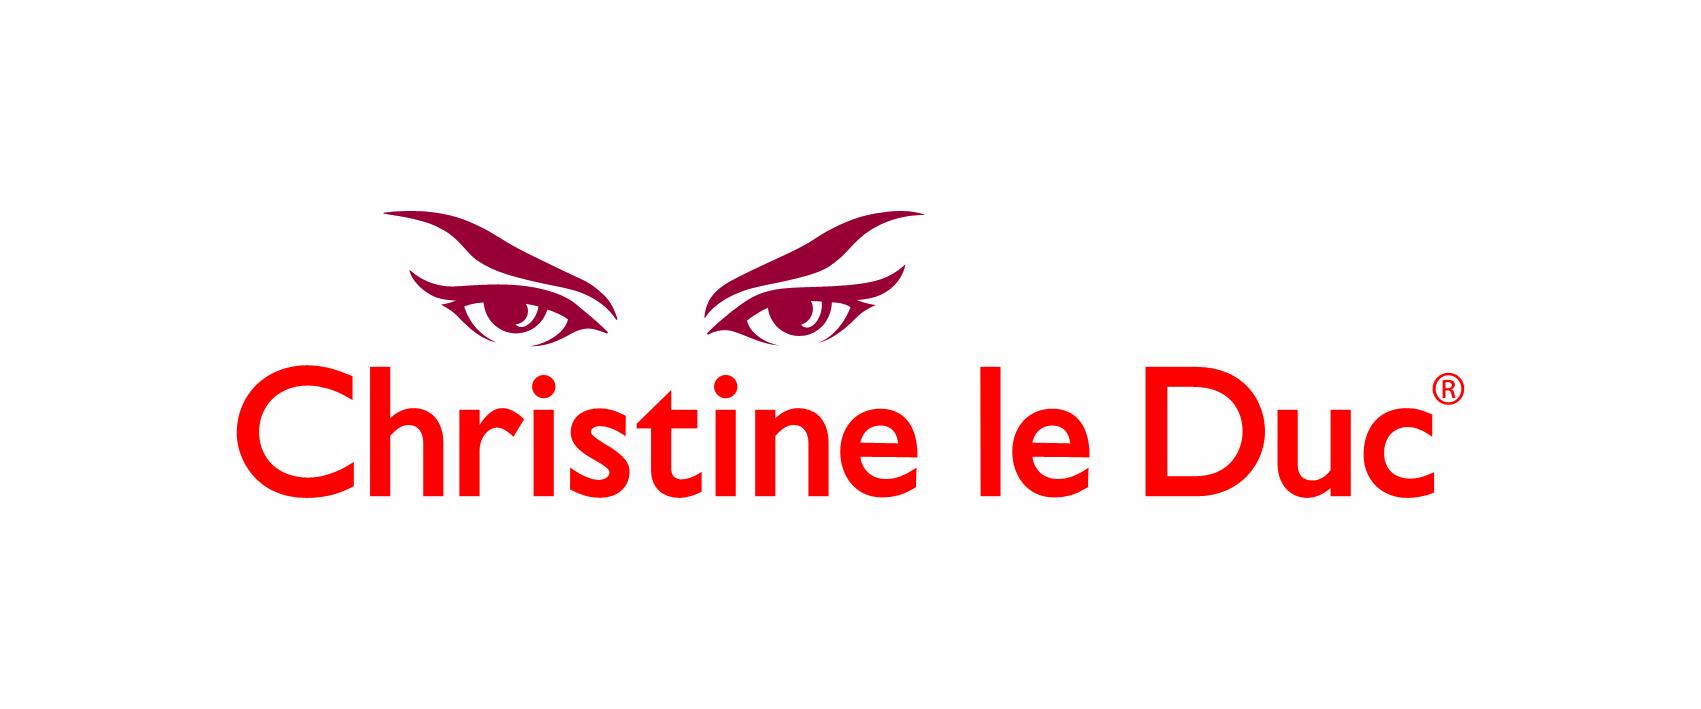 Christineleduc.nl